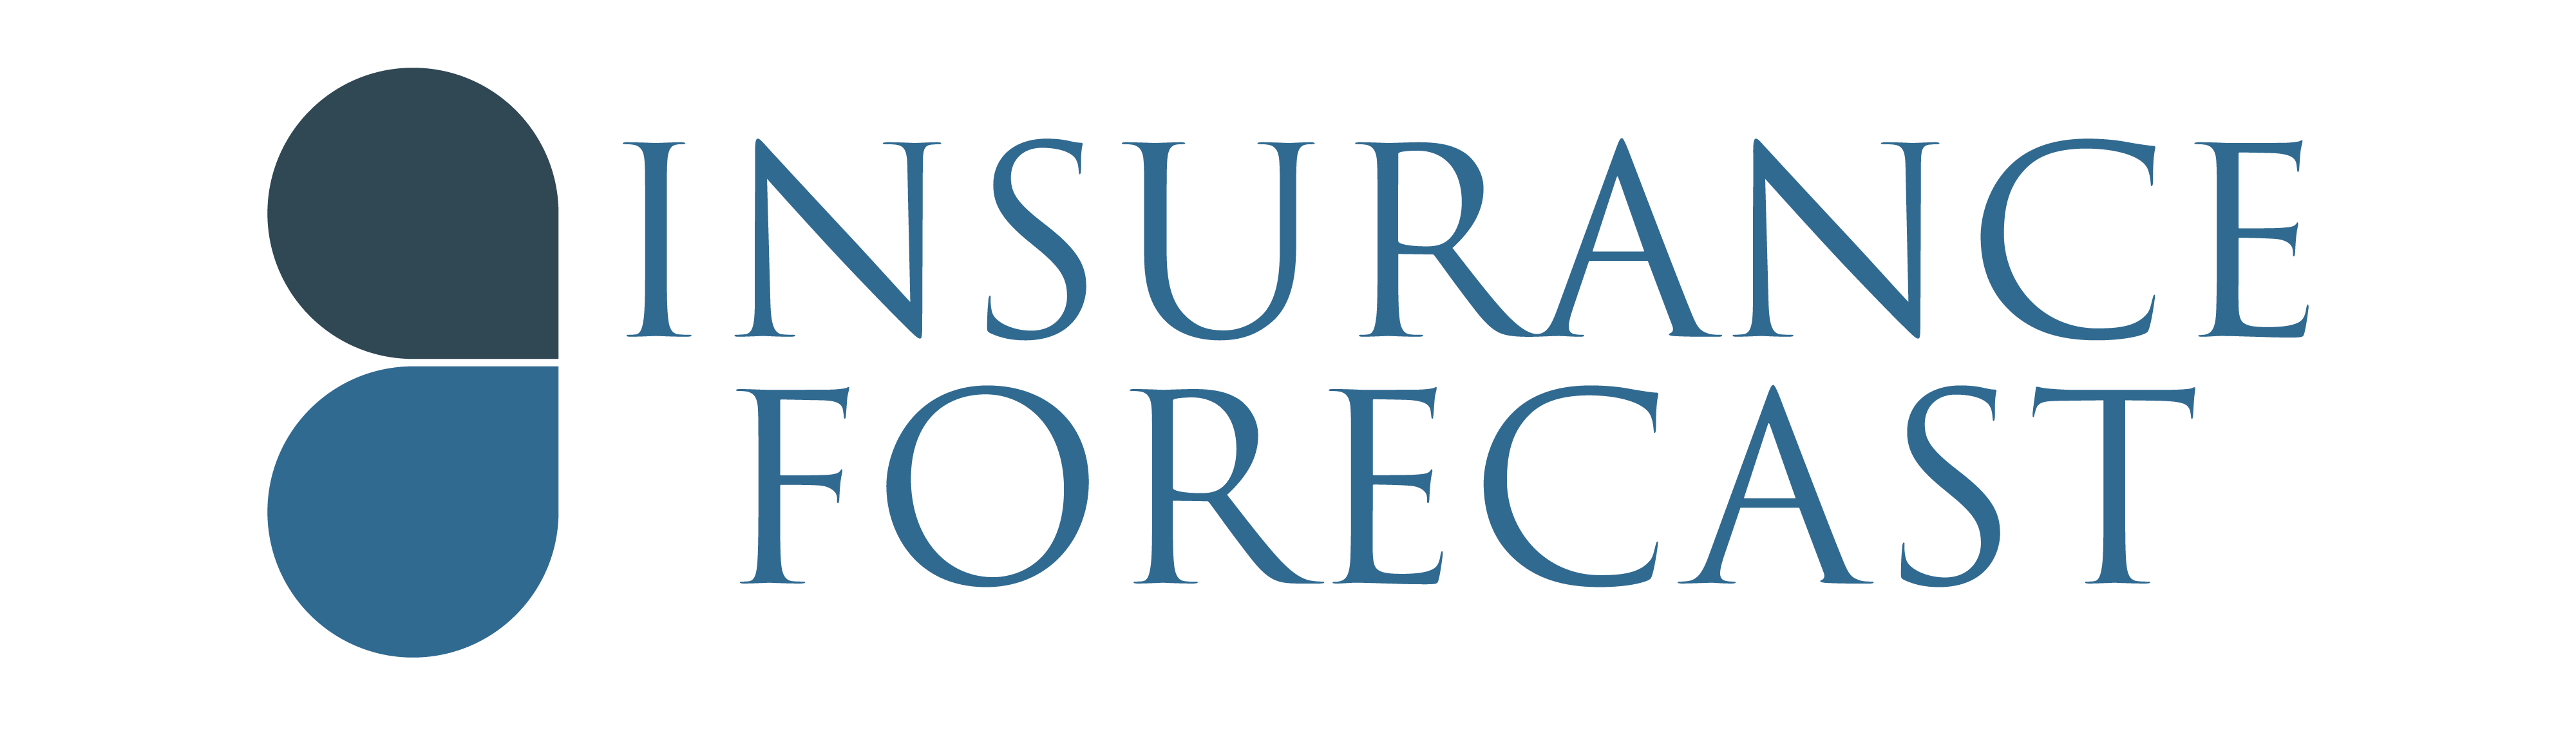 Insurance Forecast Logo